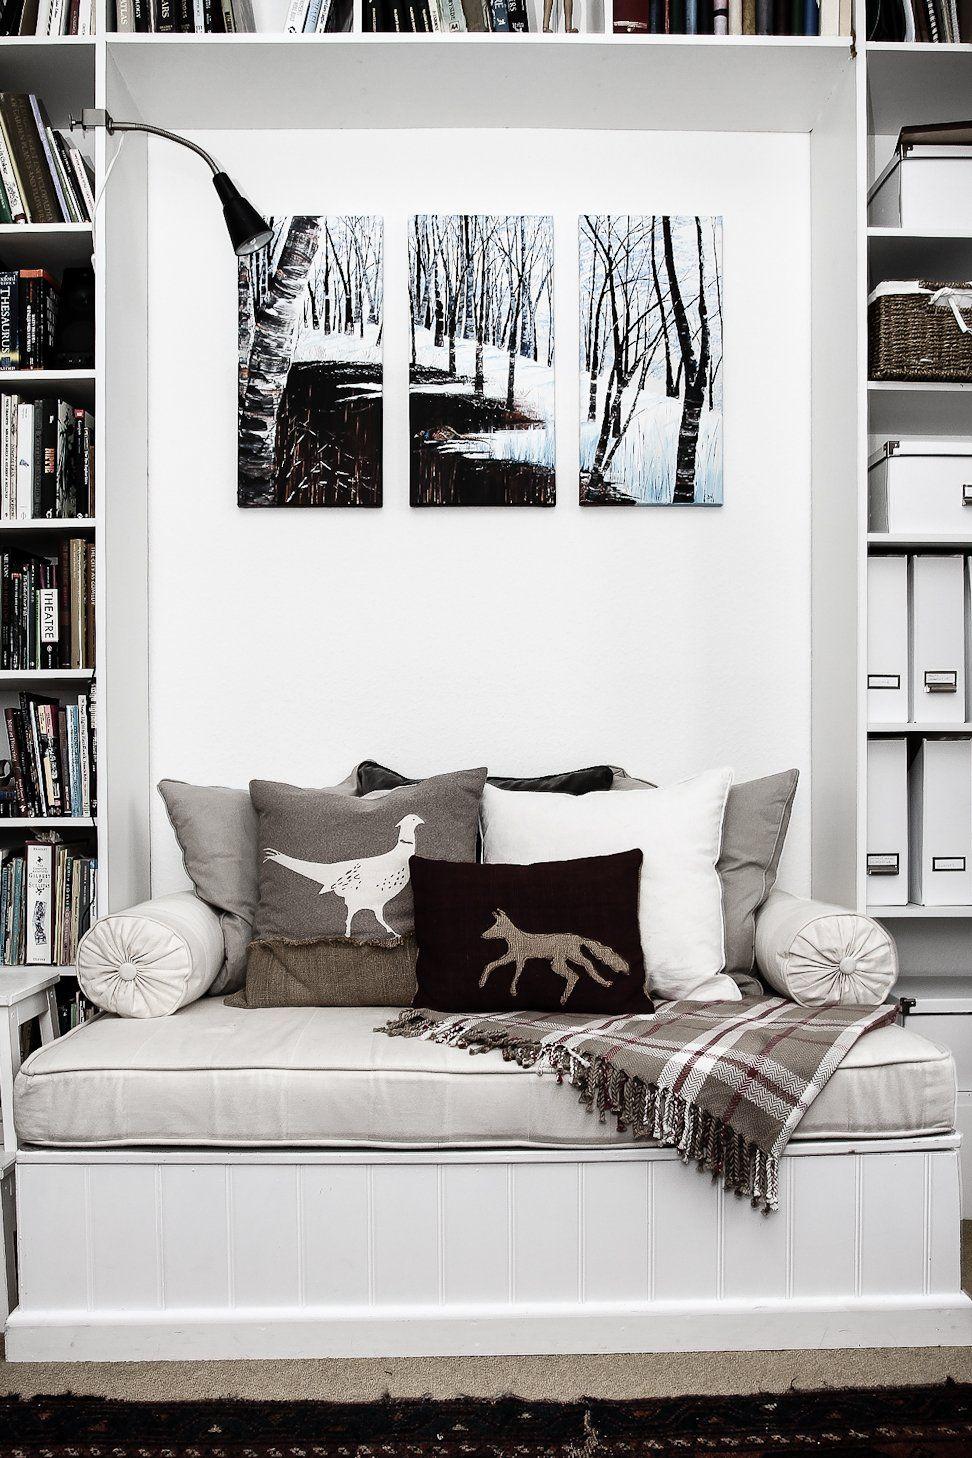 Full Size of Sofa Alternatives Cheap Couch For Small Spaces Ikea An Ingenious Bed Alternative Upcycled Foldaway Leder Bora Canape Blau Big Braun Ewald Schillig Türkis Sofa Sofa Alternatives